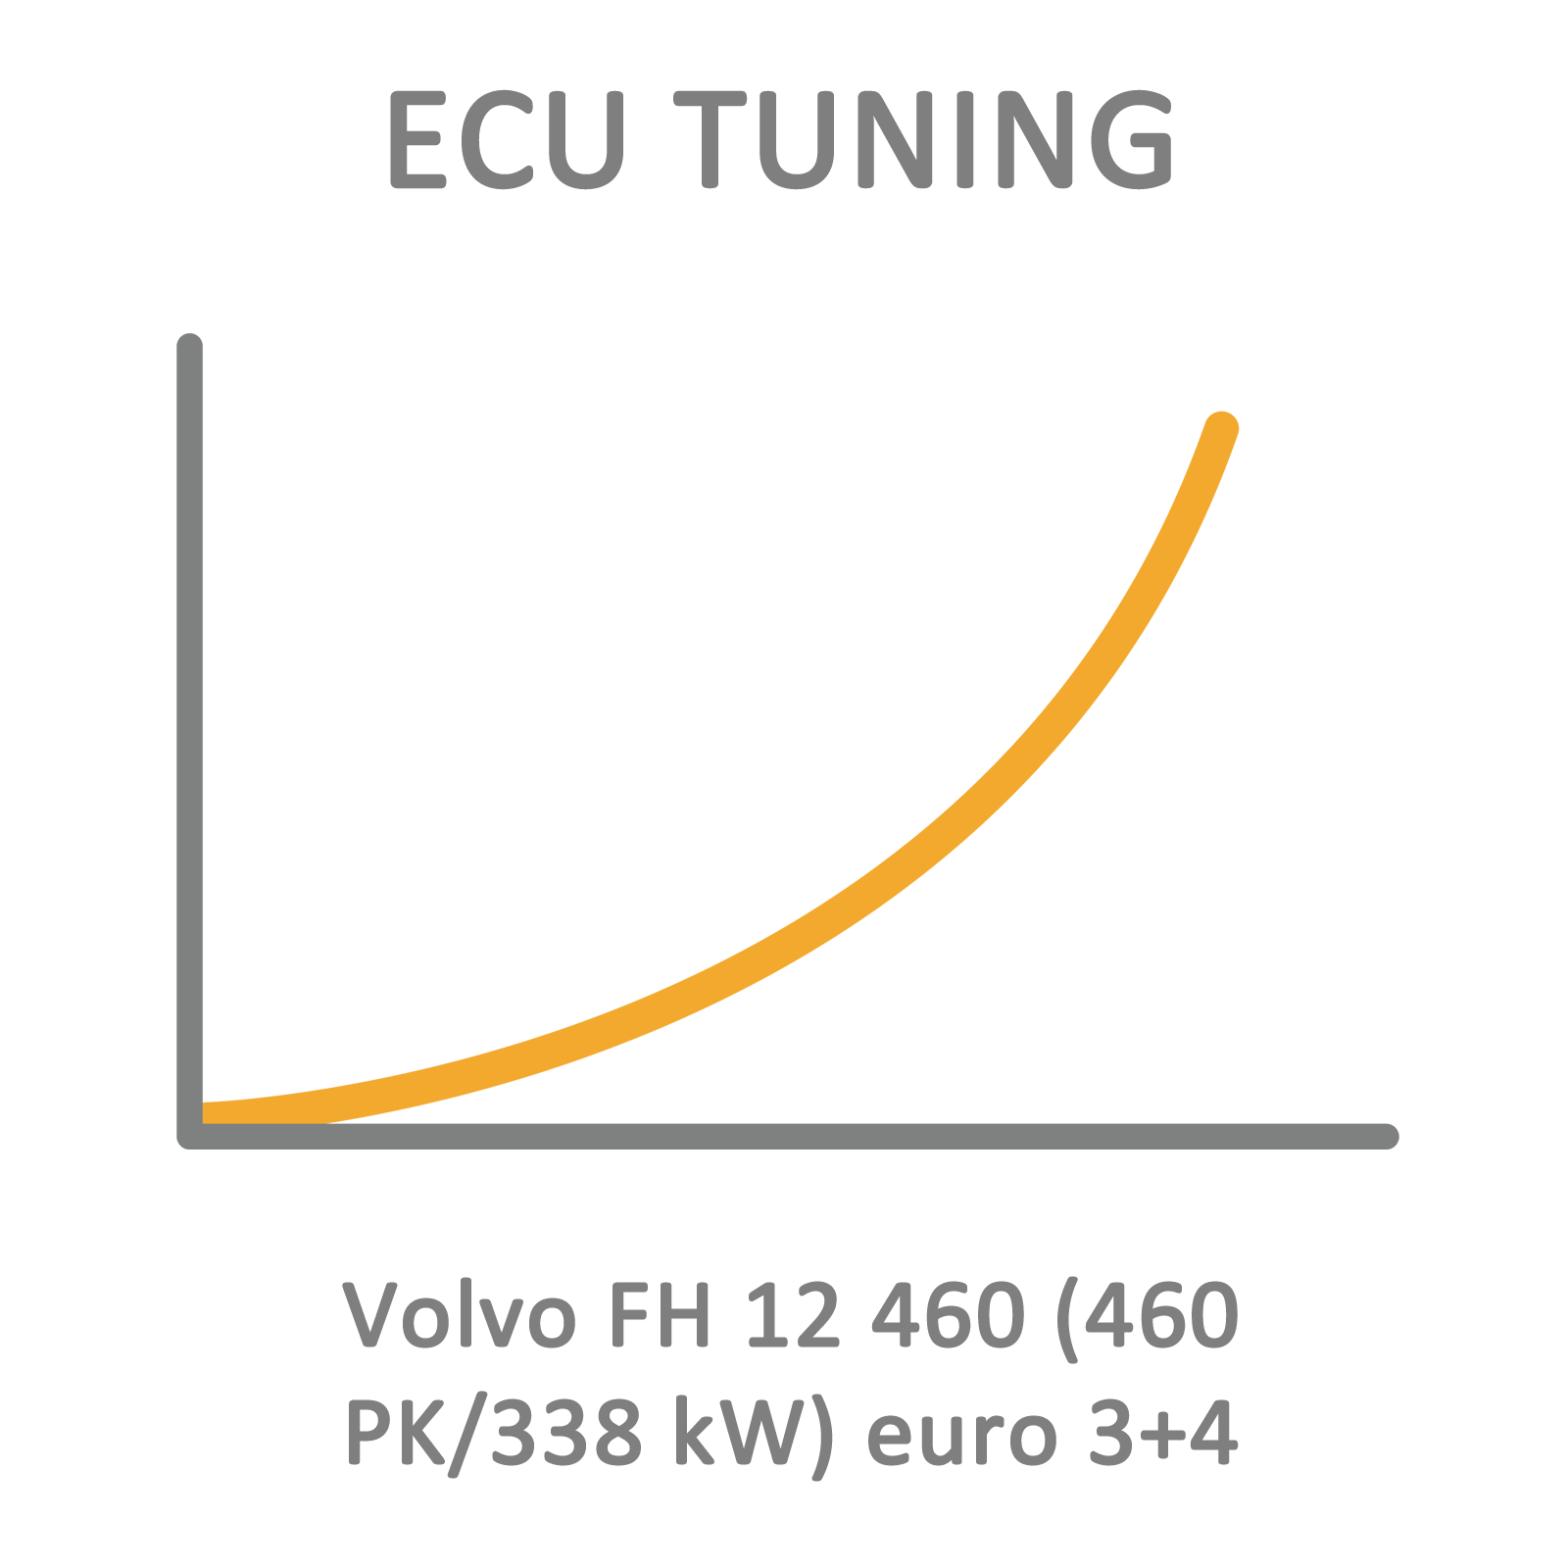 Volvo FH 12 460 (460 PK/338 kW) euro 3+4 ECU Tuning